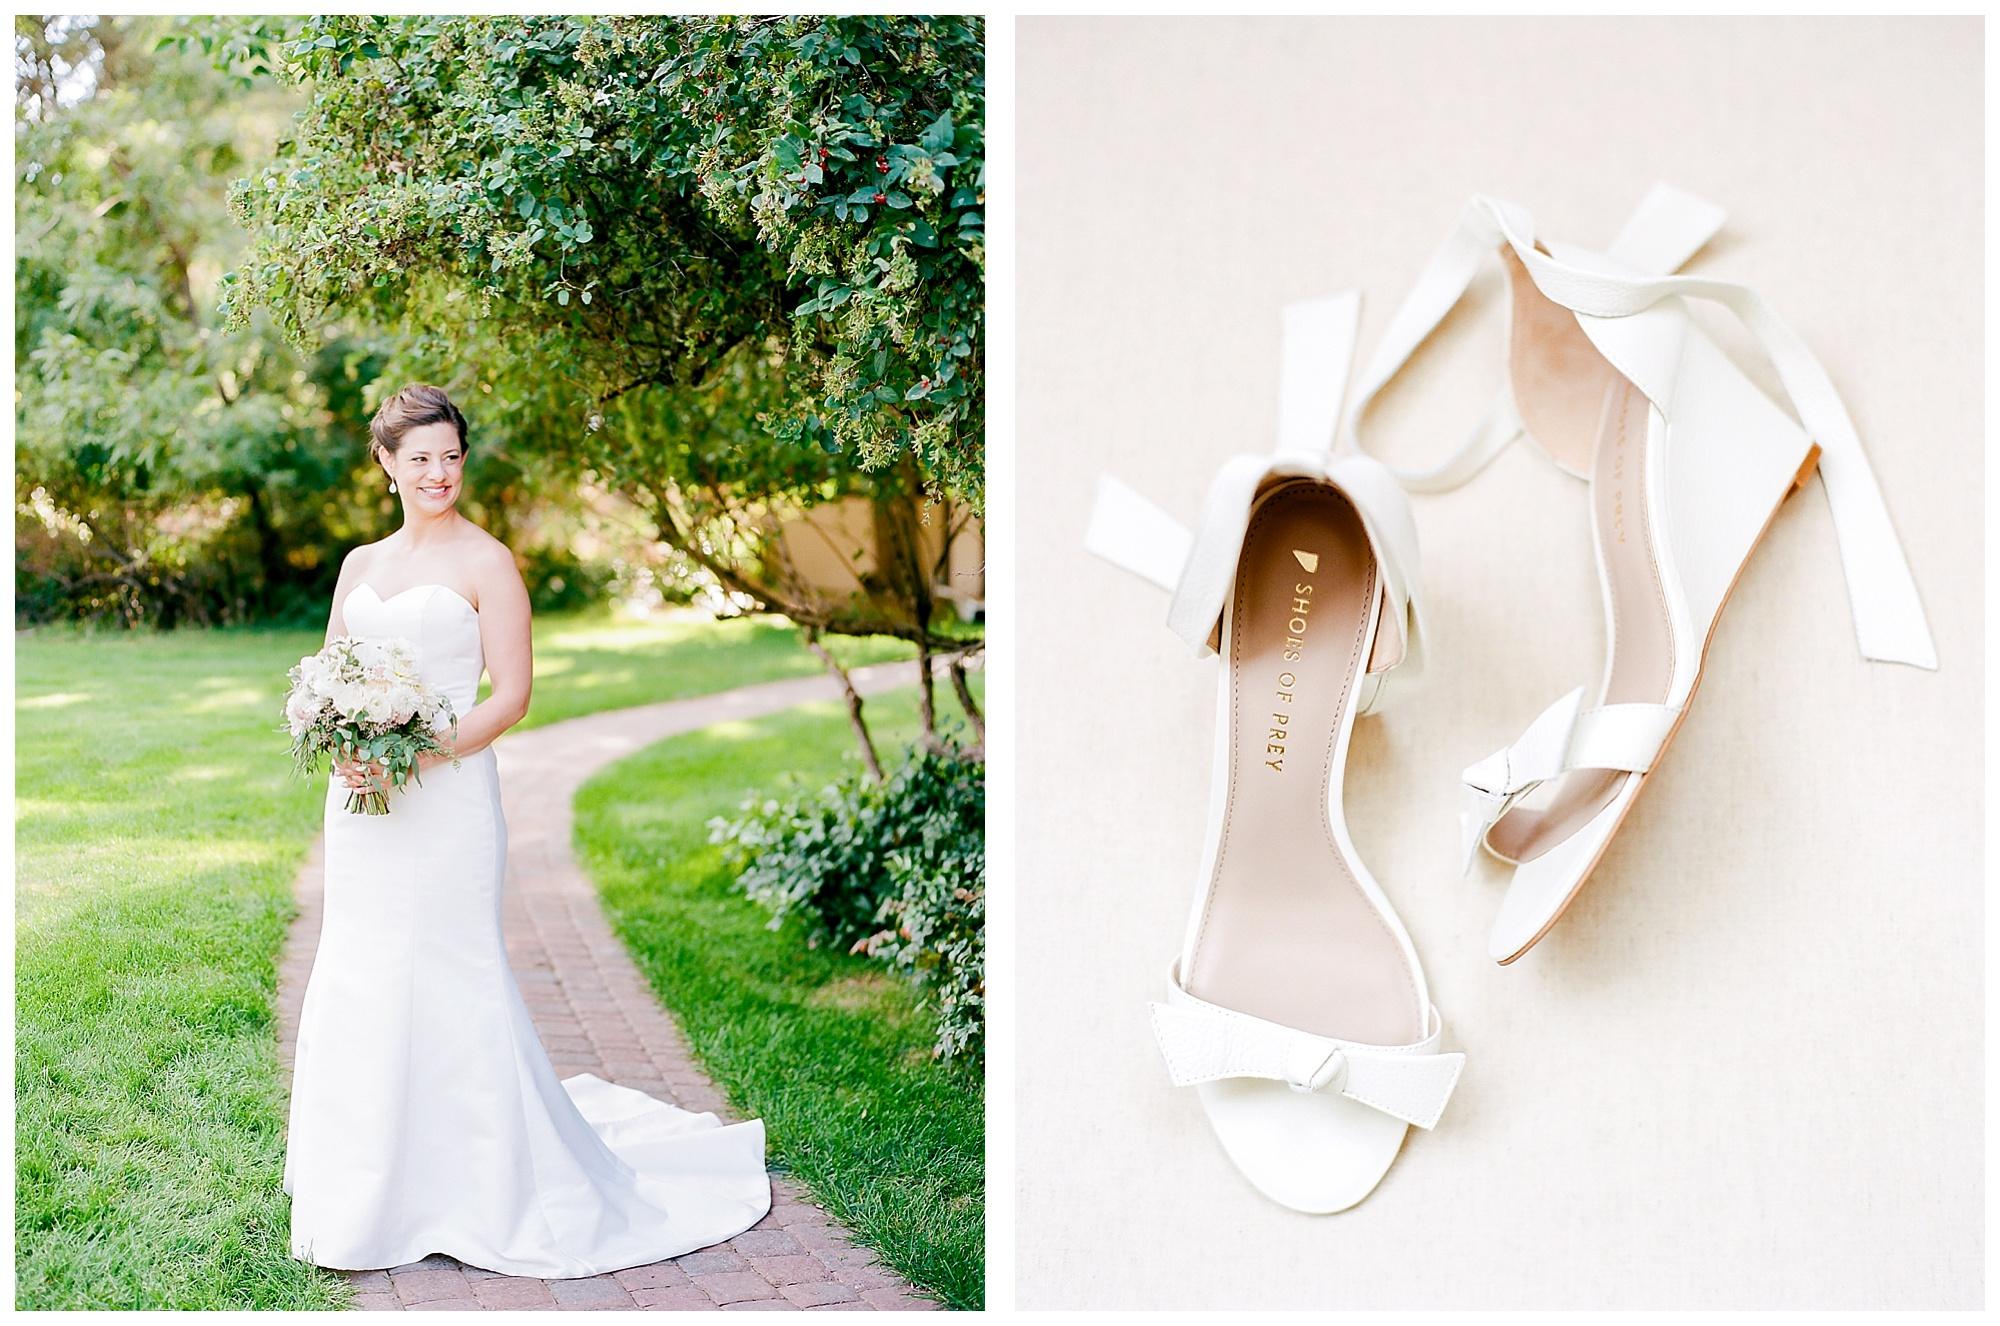 Bozarth-Mansion-wedding-spokane-photography-12.jpg